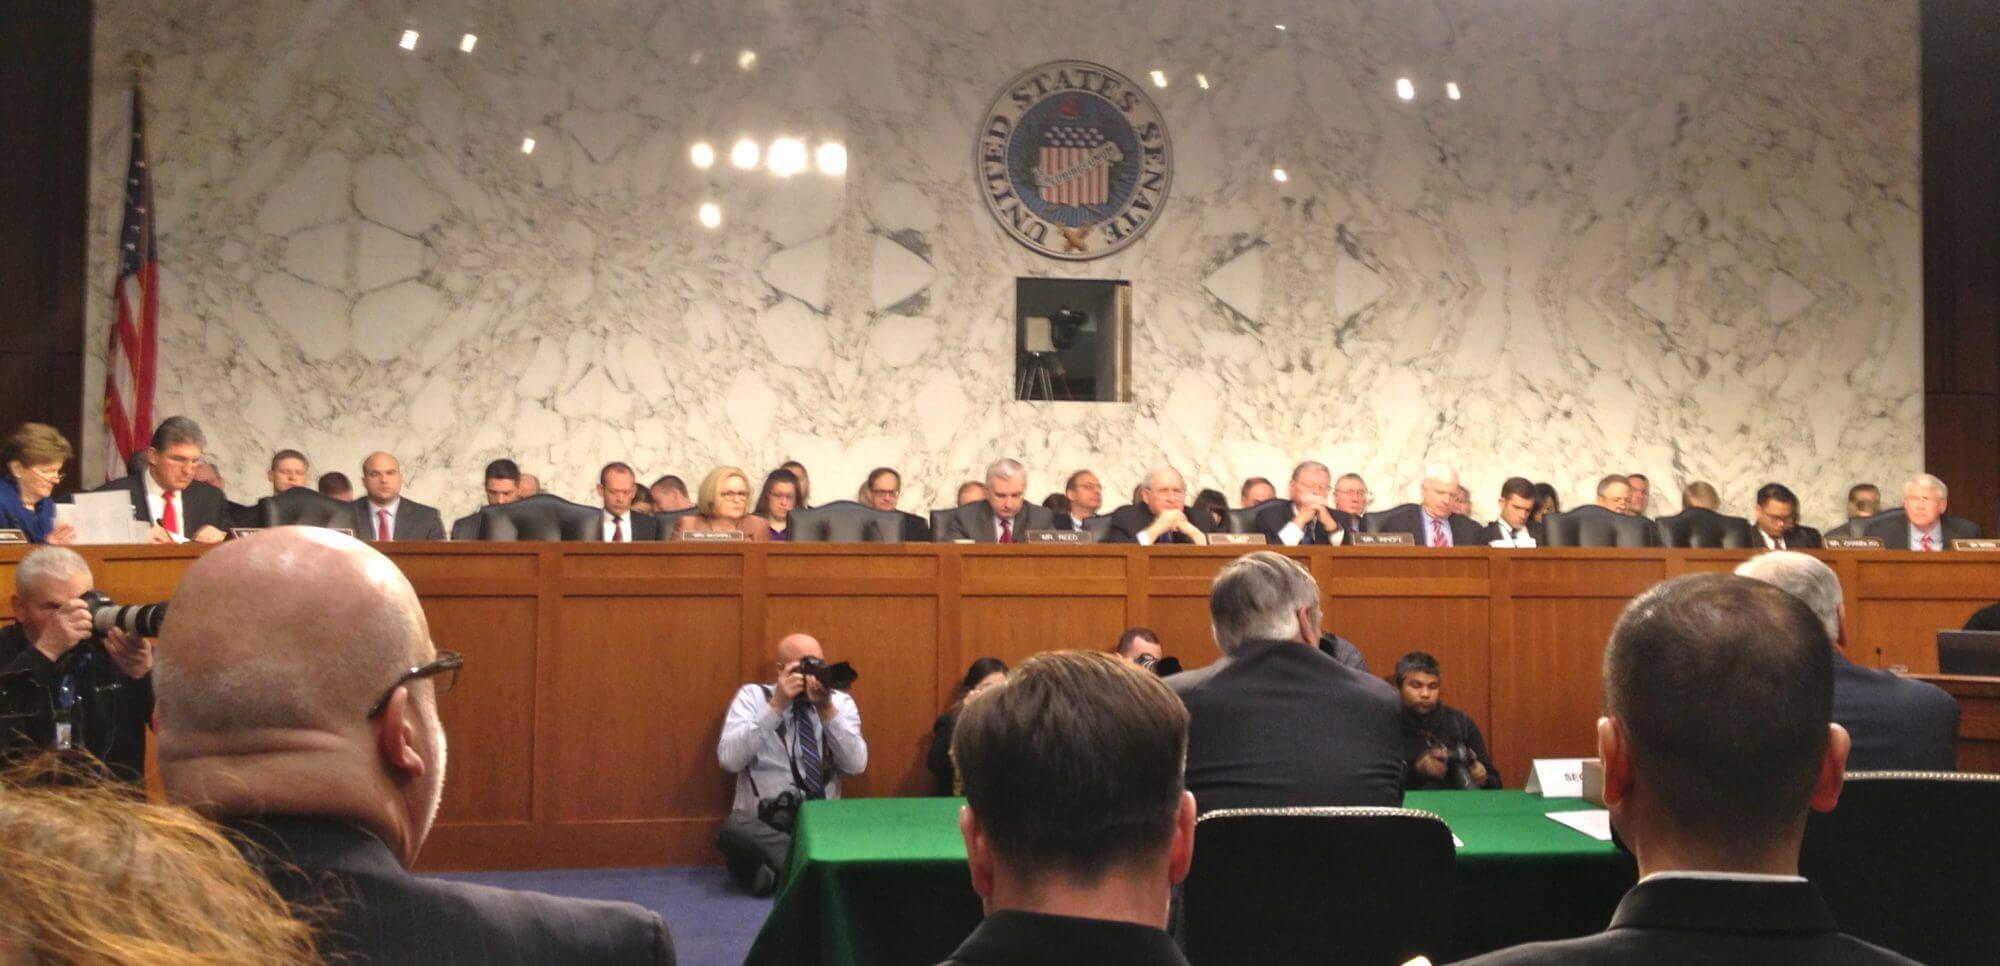 Hagel backs Obama's approach to Ukraine